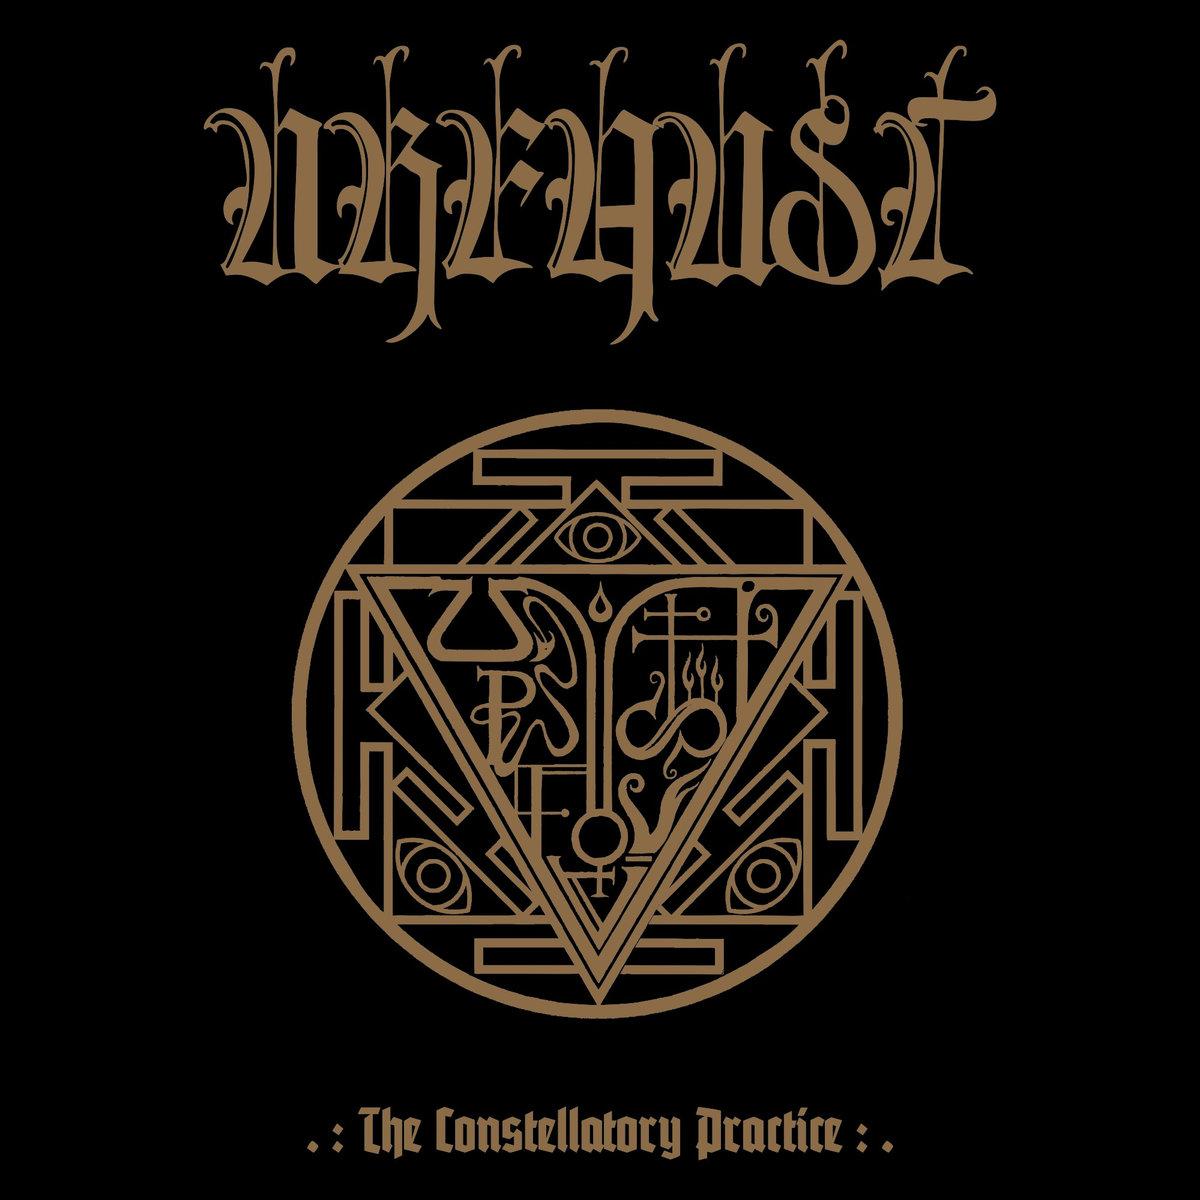 125 - Urfaust -The Constellatory Practice